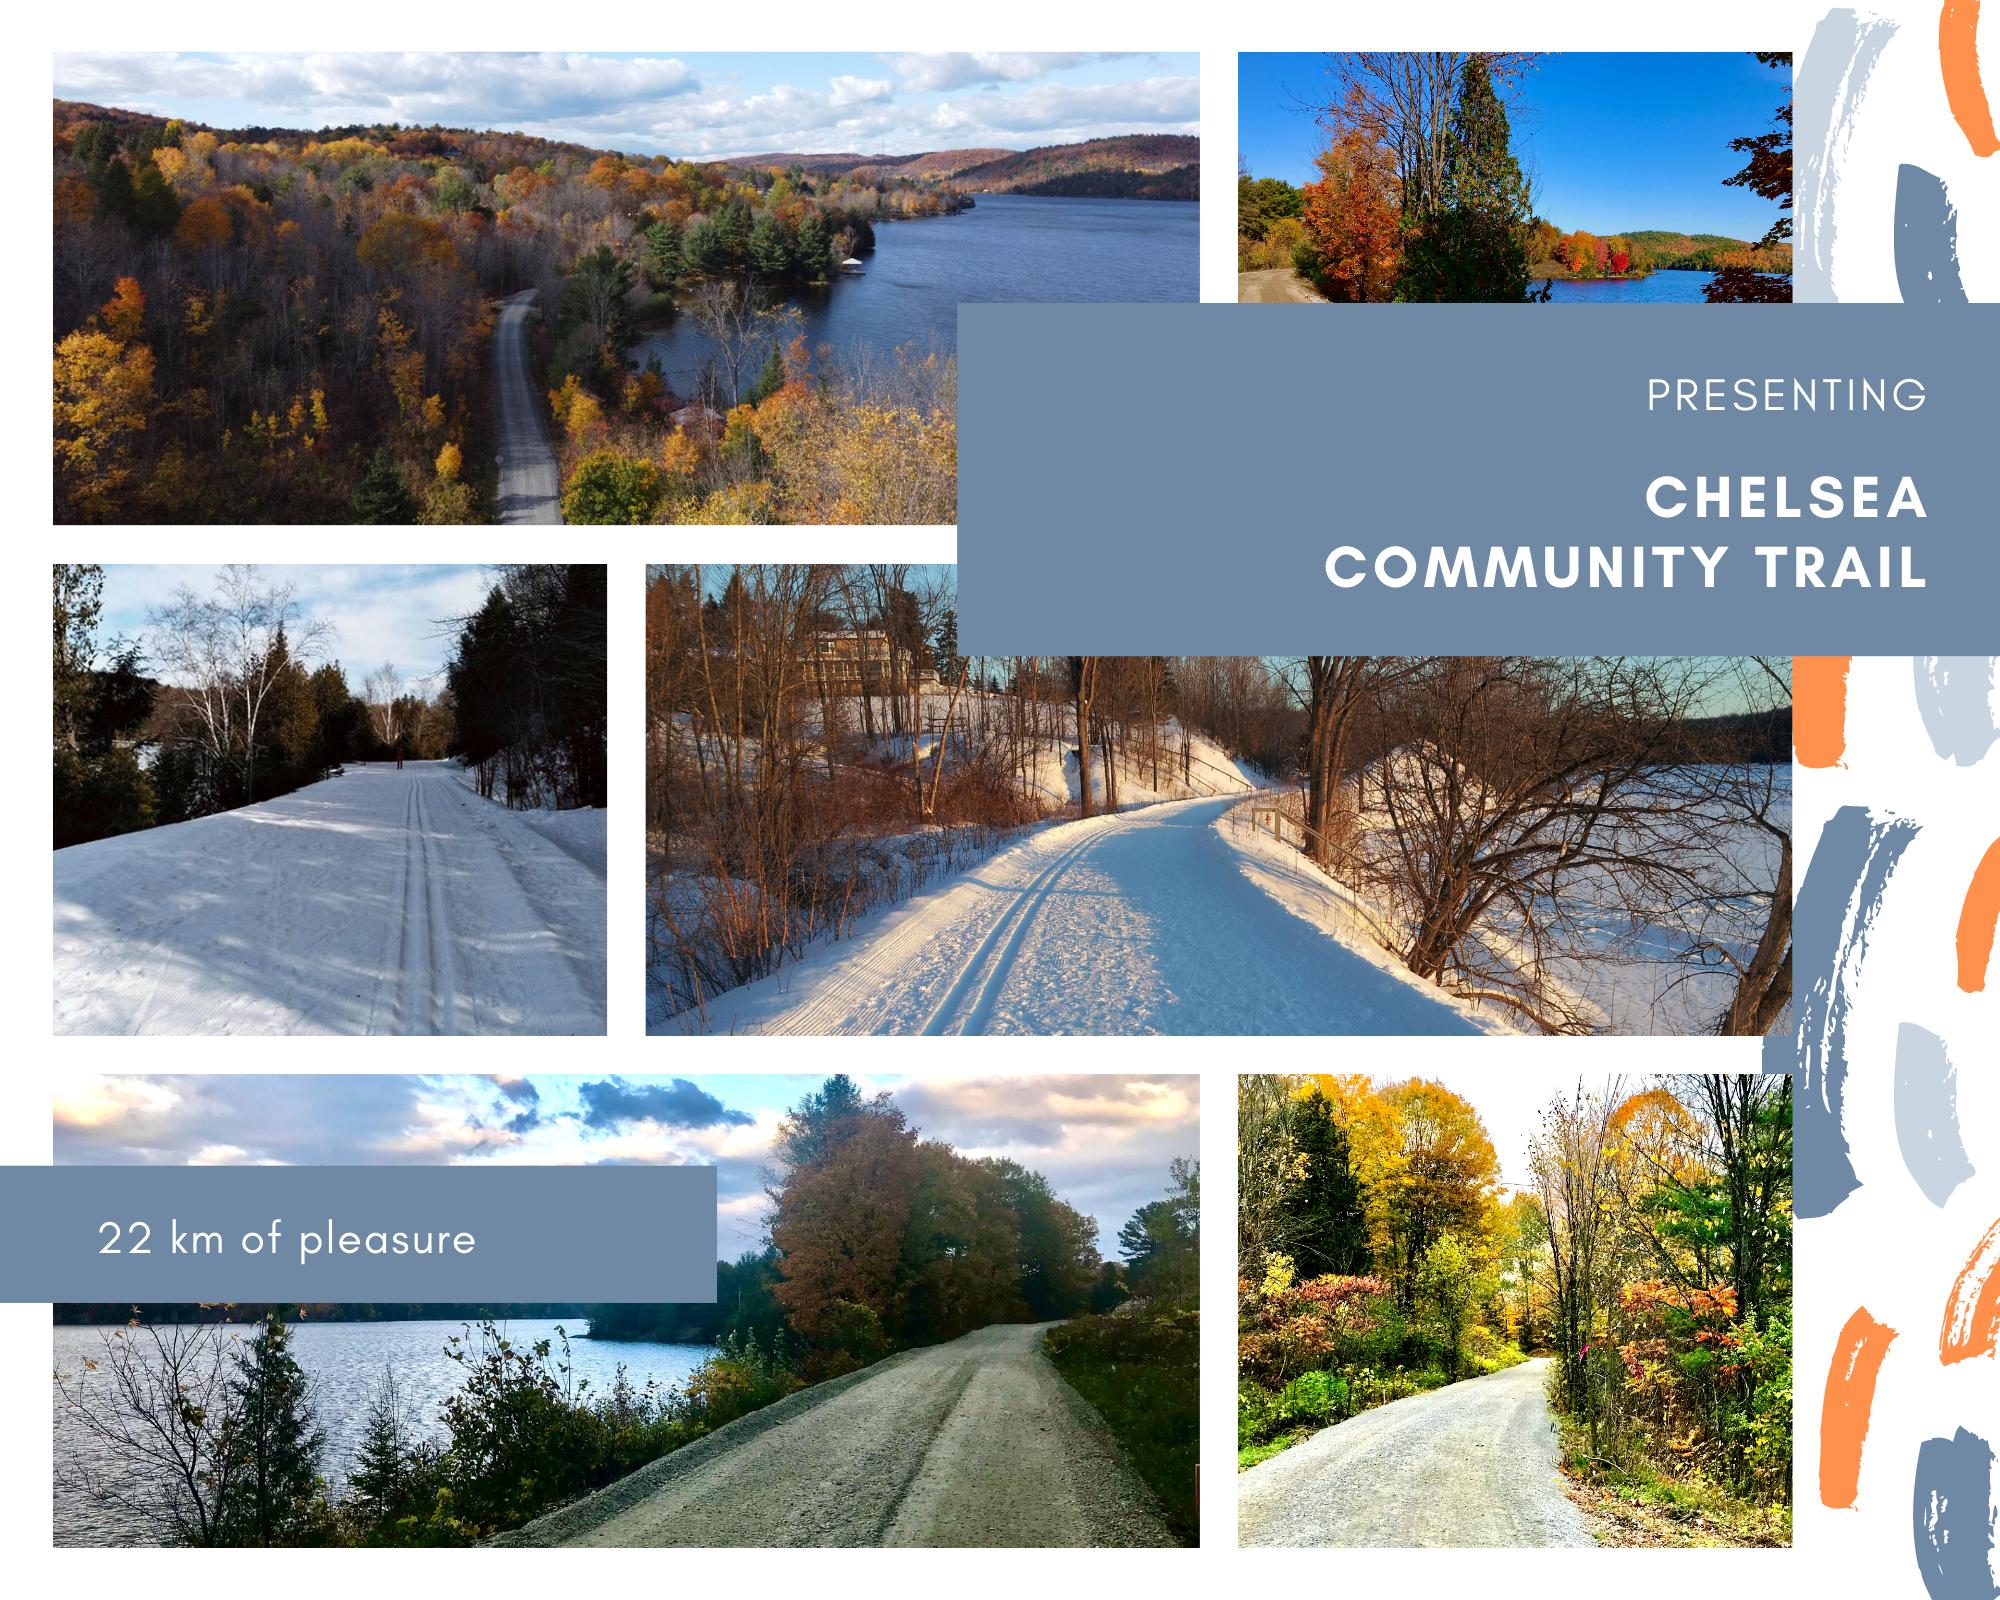 Chelsea Community Trail